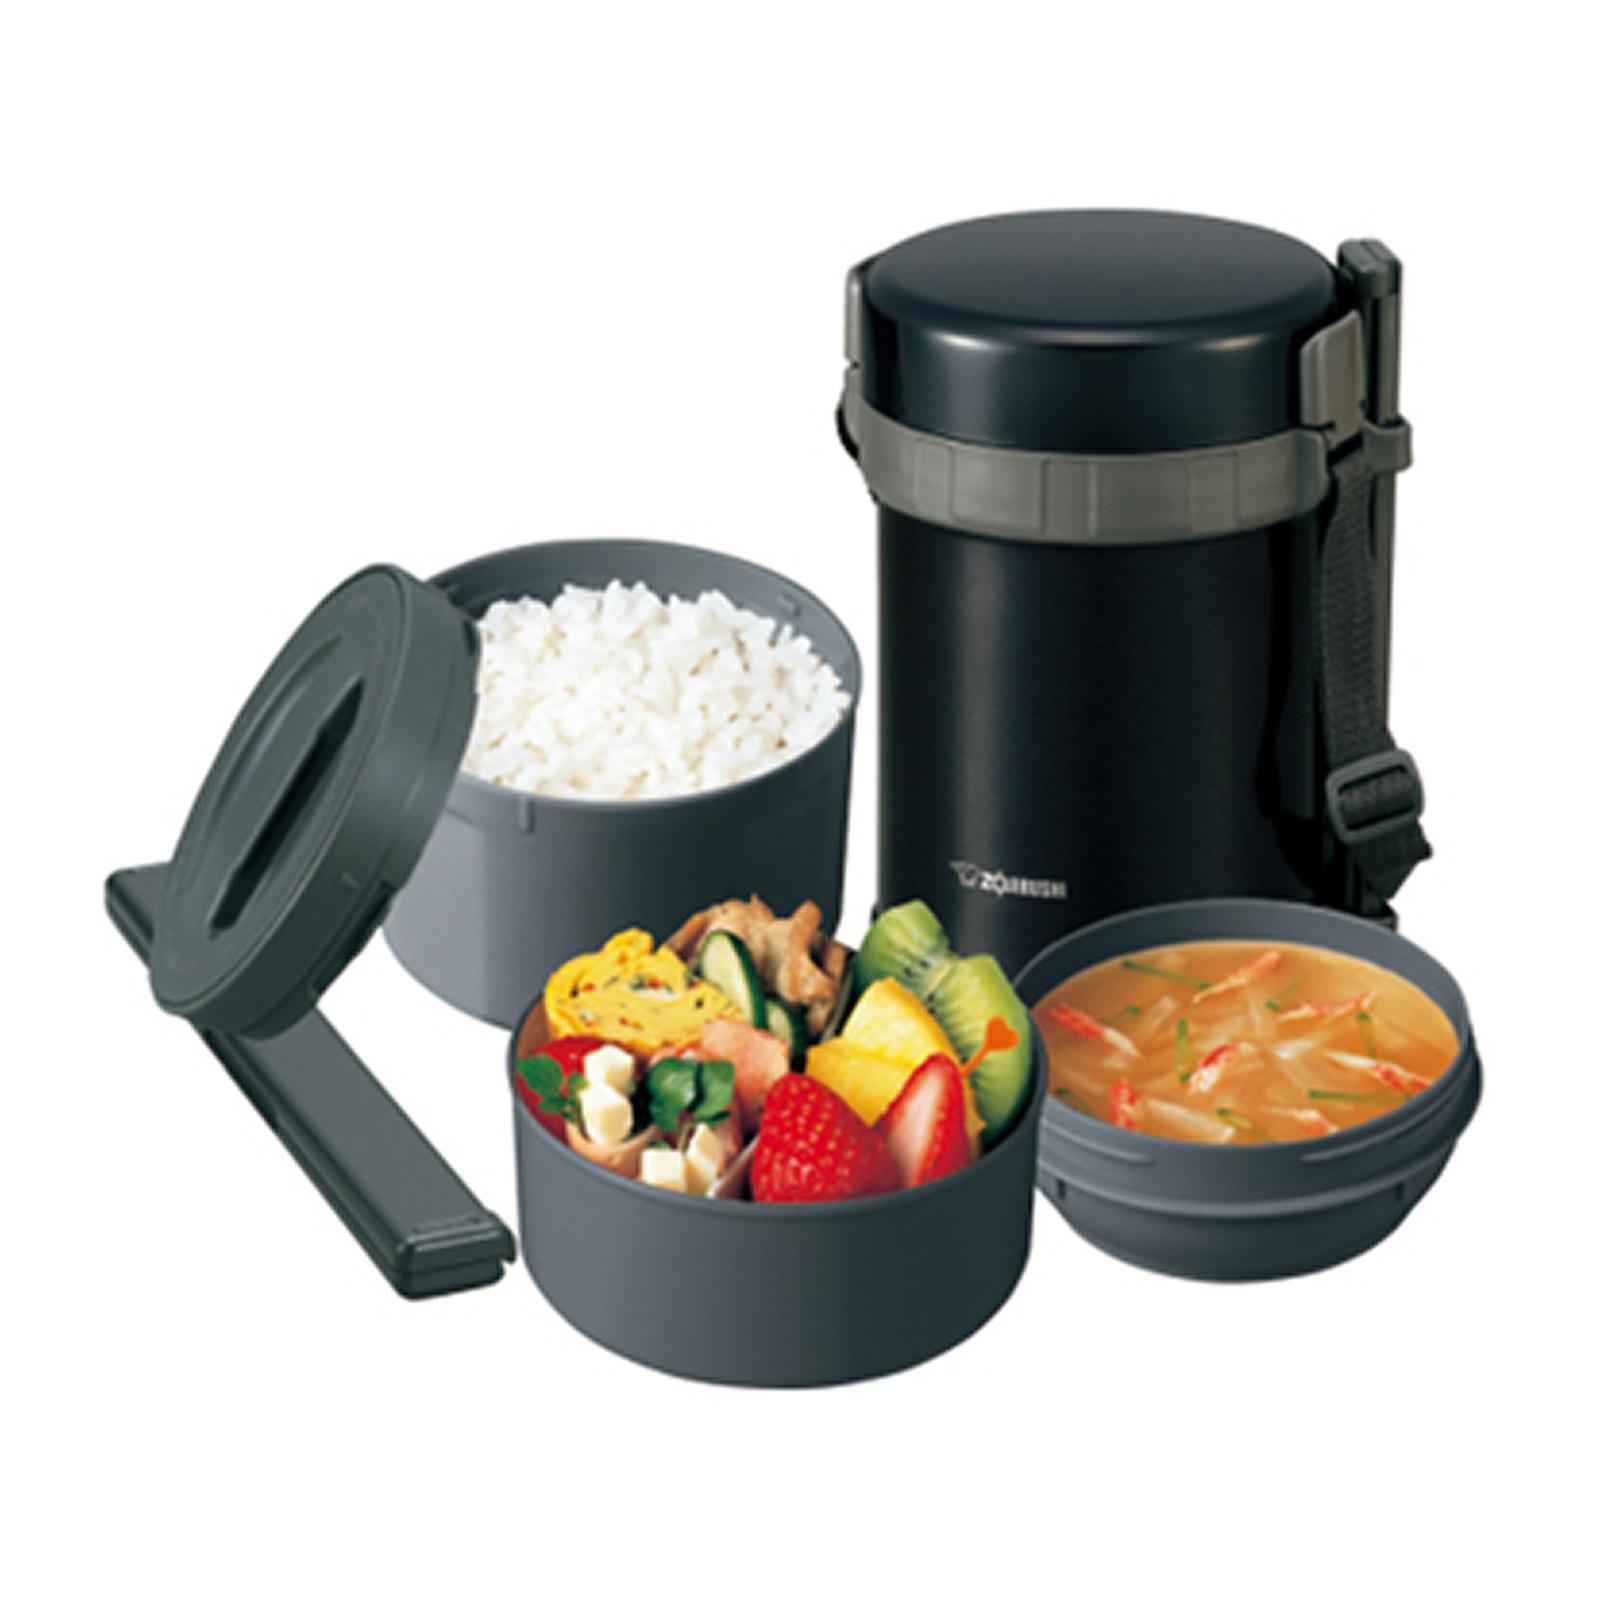 Zojirushi 1.27 Stainless Steel Food Jar - Lunch Kit